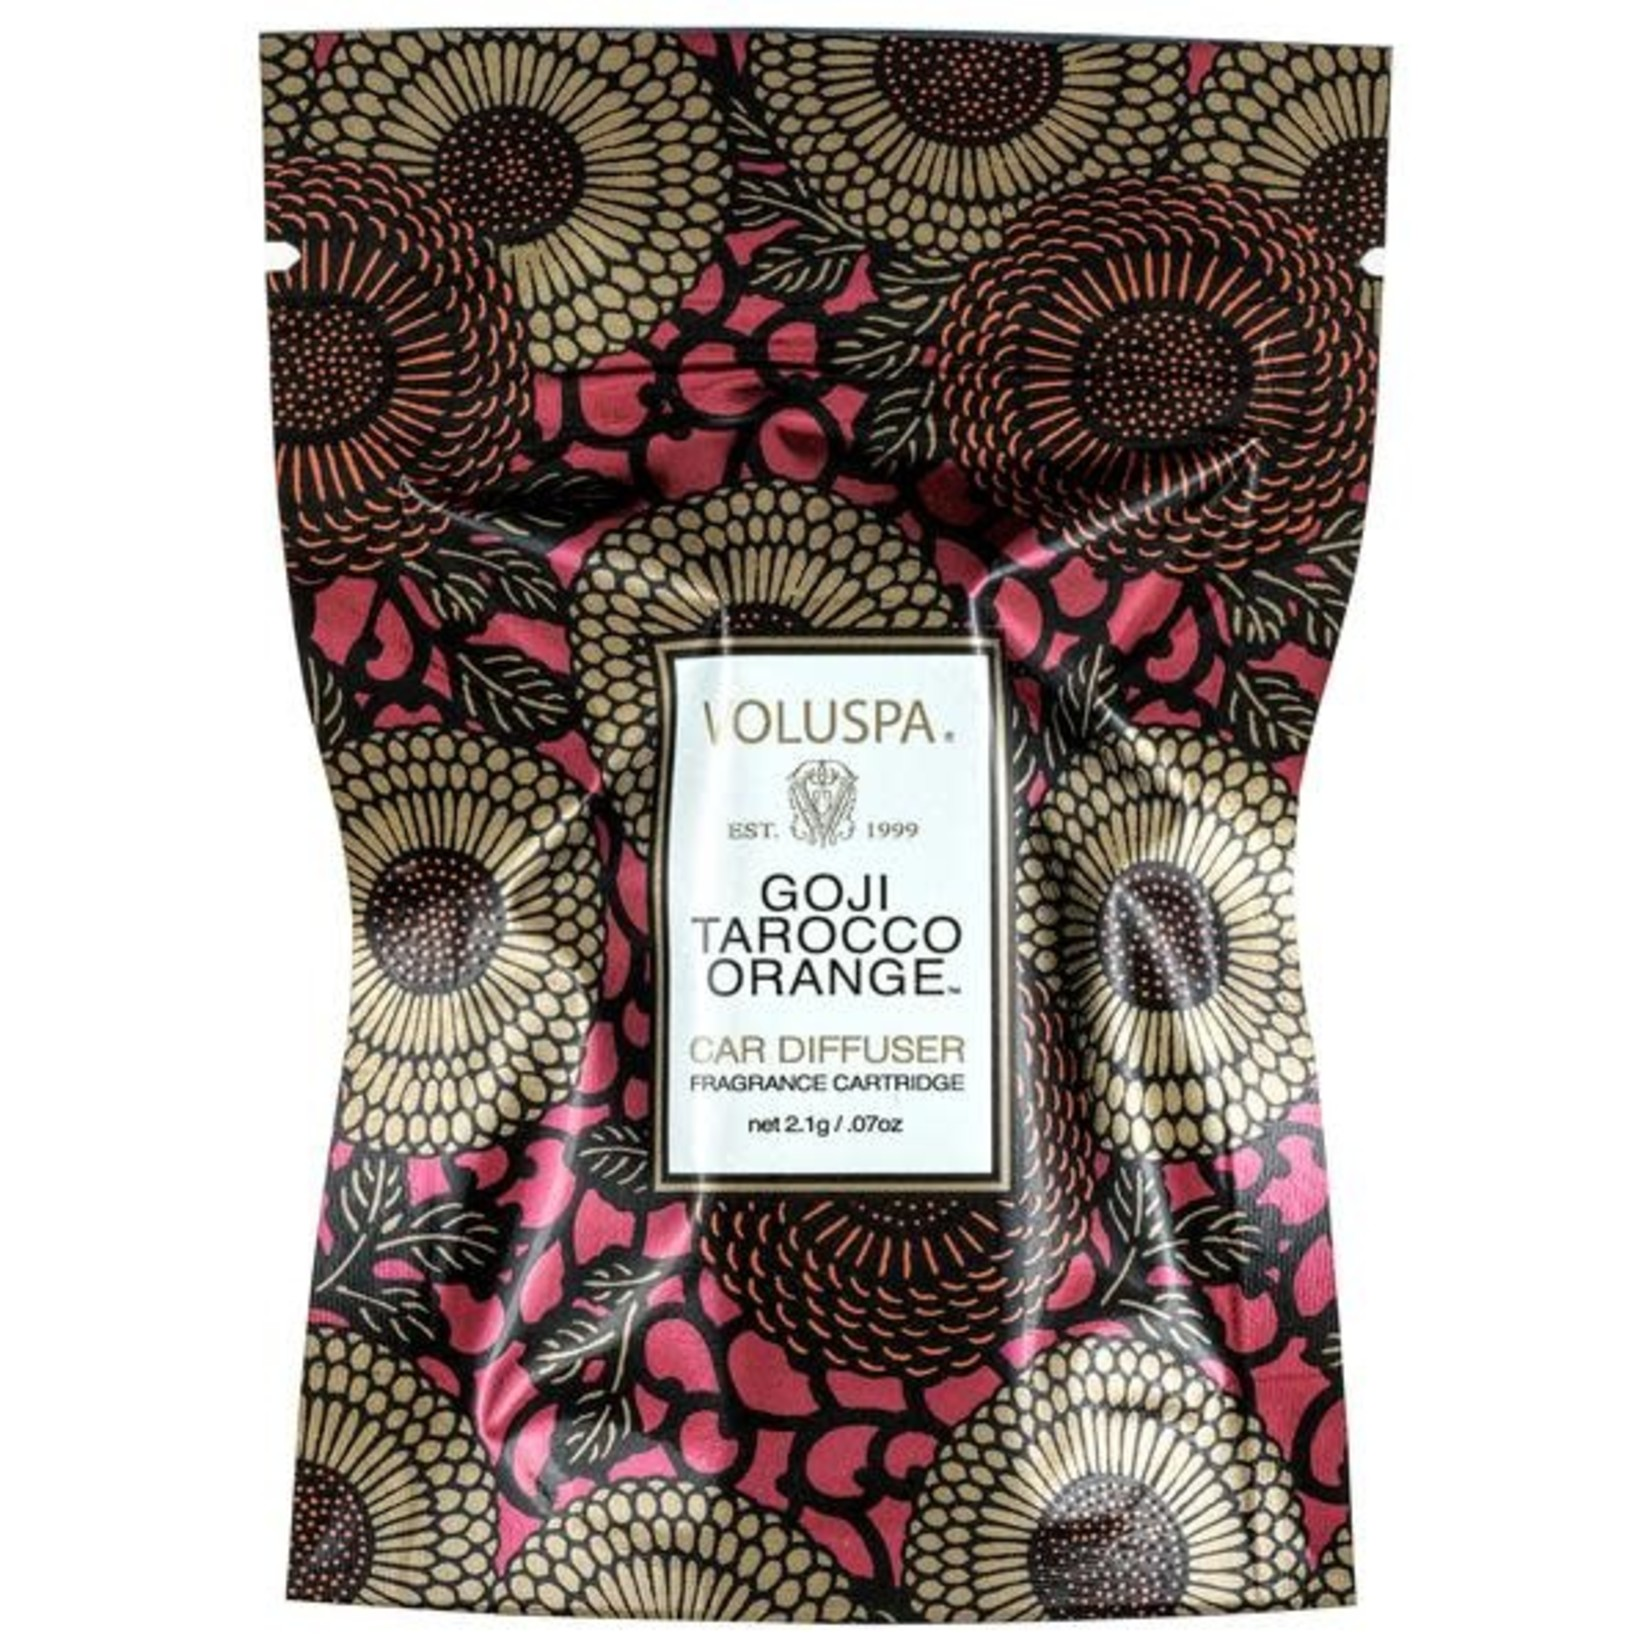 Voluspa Goji Fragrance Cartridge Refill pouch